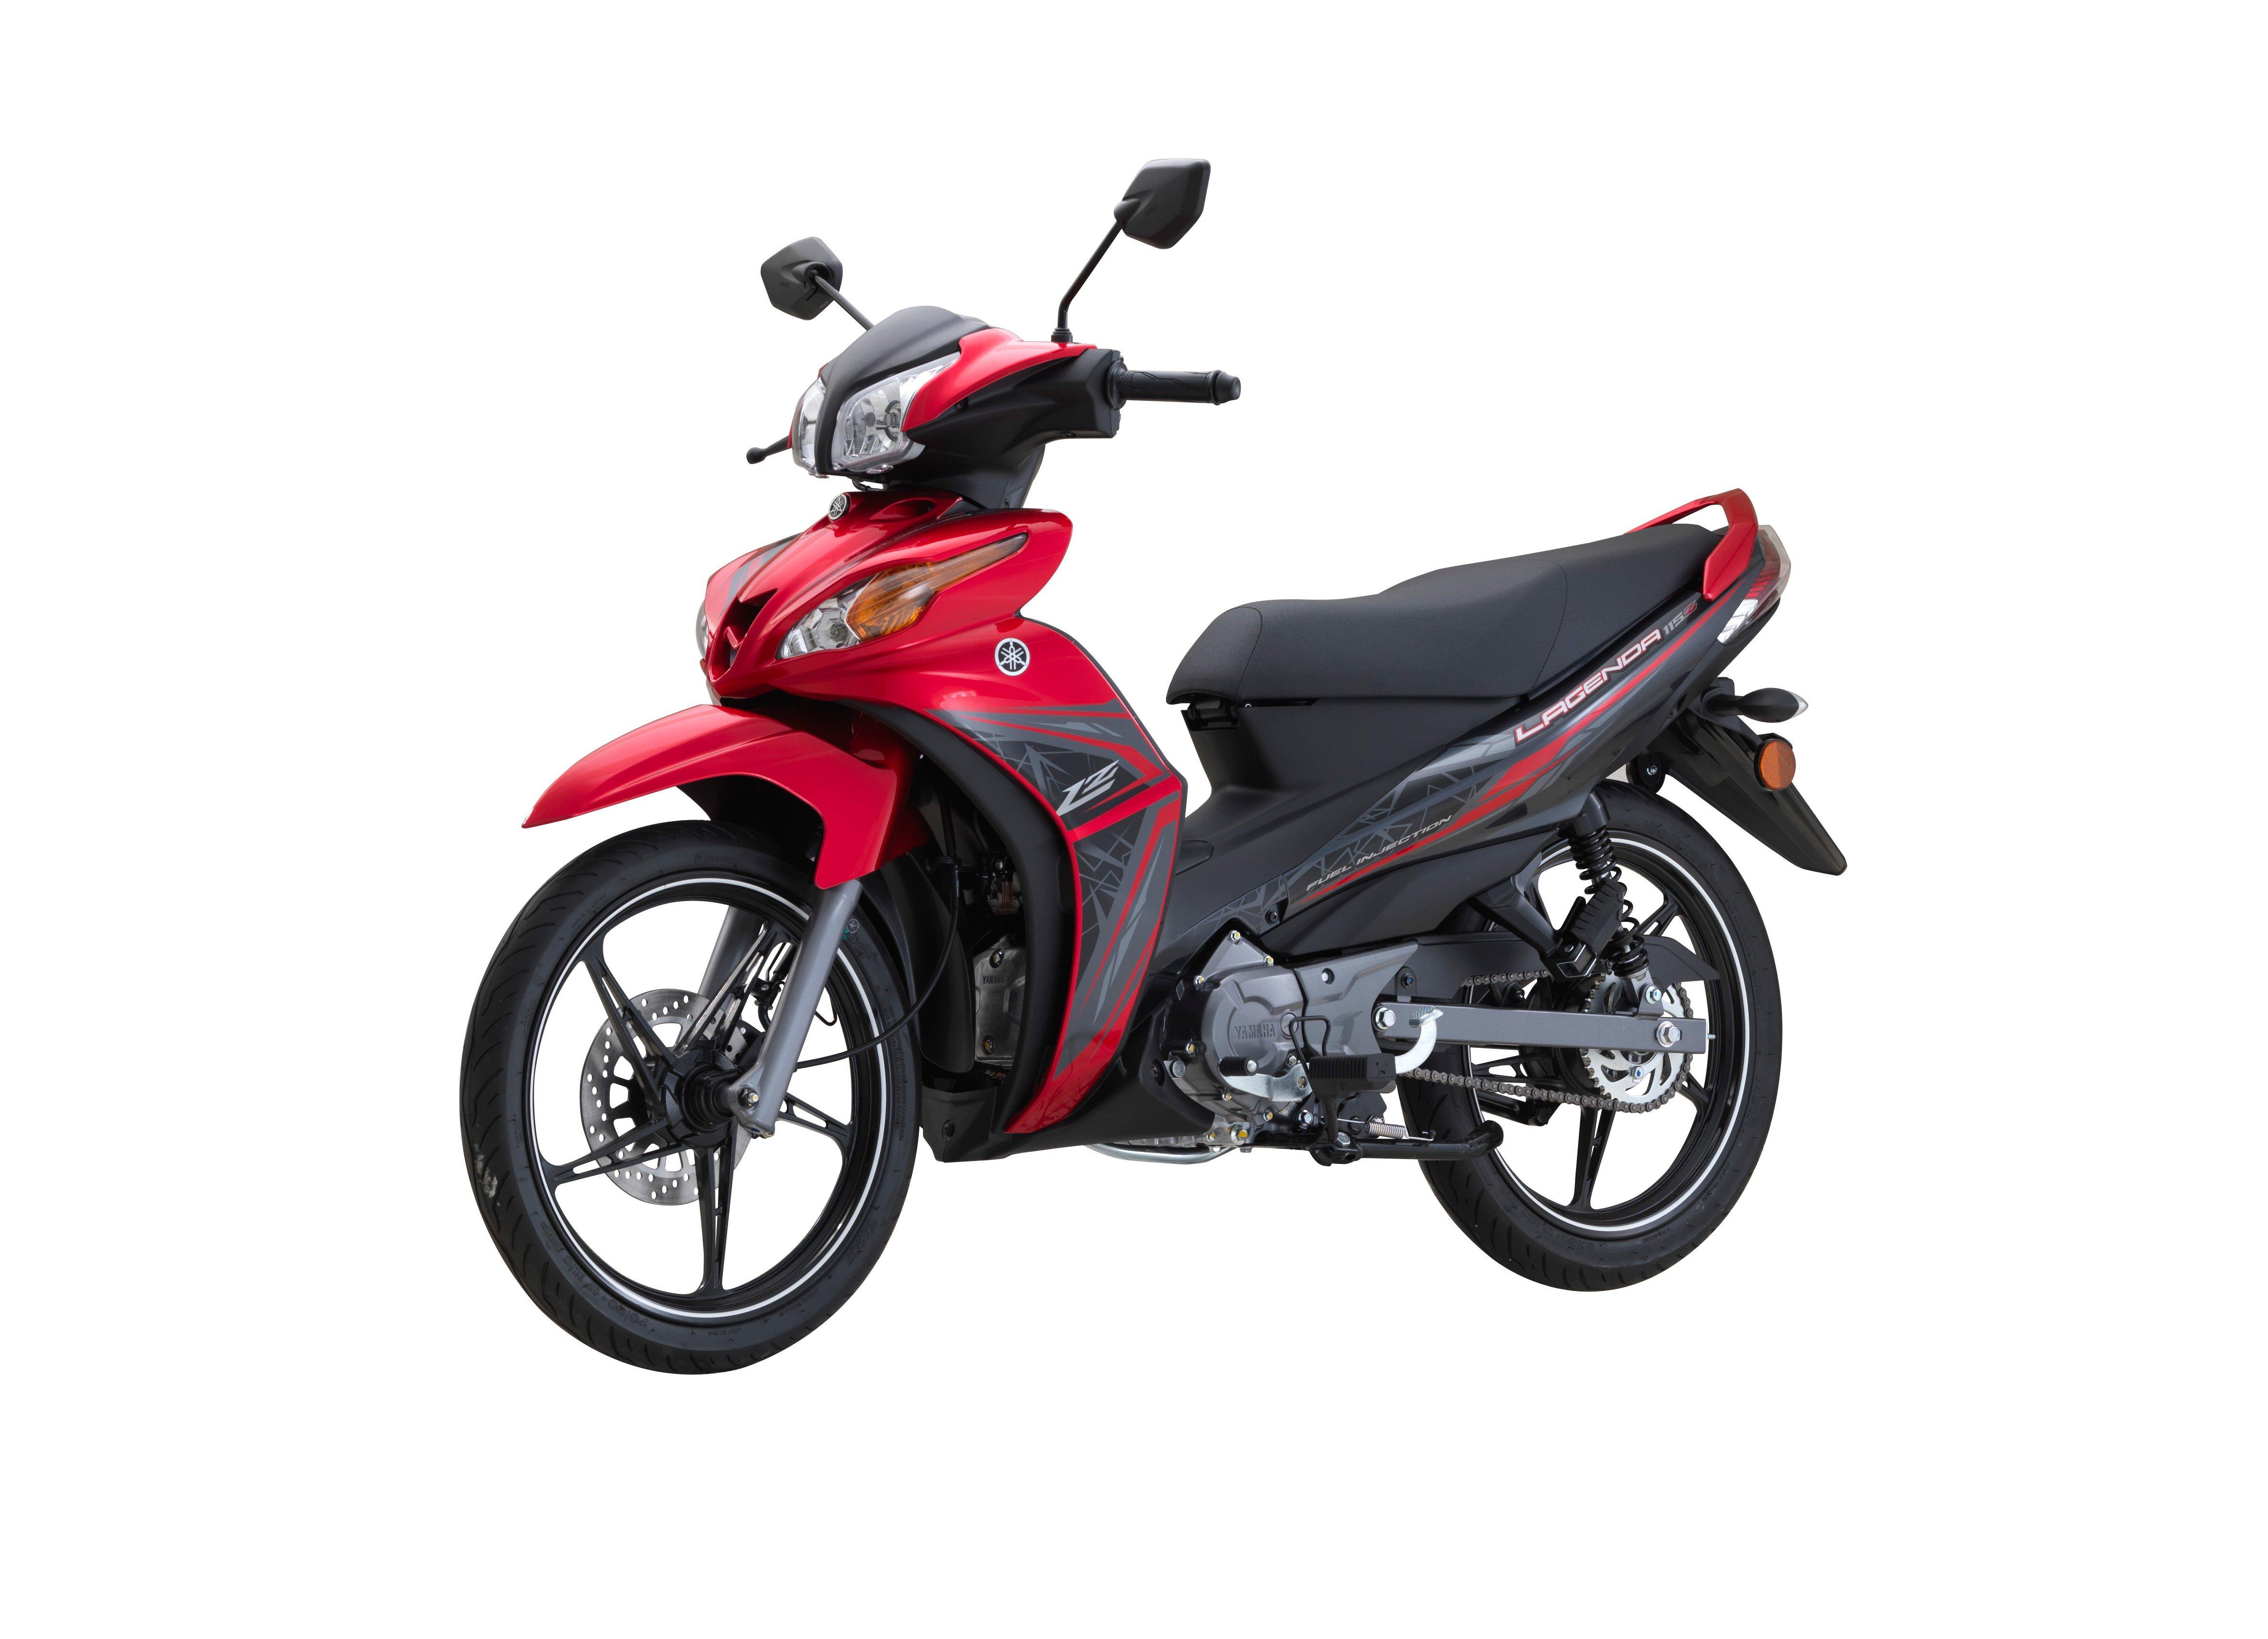 Koleksi 69 Modifikasi Yamaha Lagenda 110 Terunik Kempoul Motor